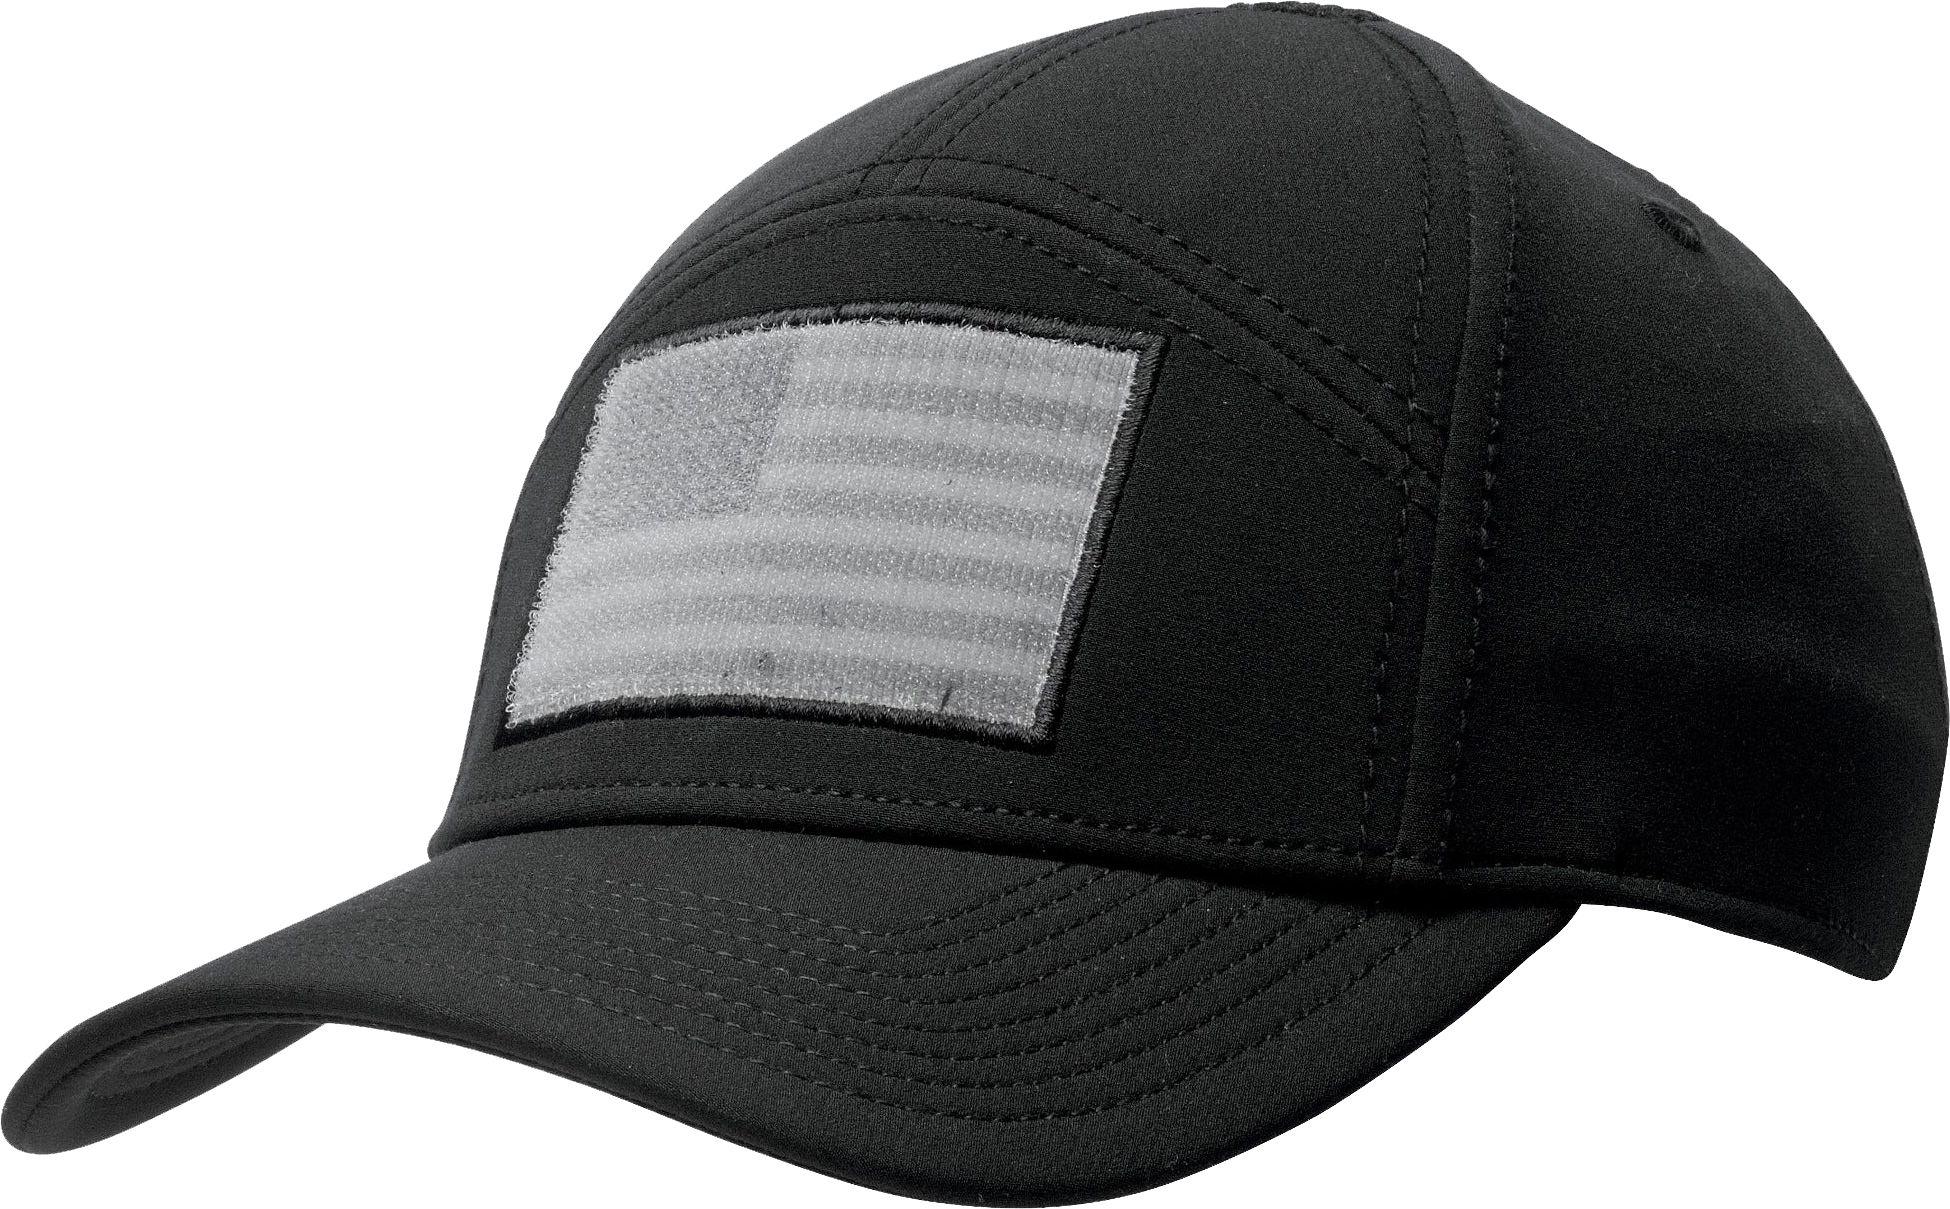 5.11 Tactical Men's Operator 2.0 A-Flex Hat, Medium/Large, Black thumbnail